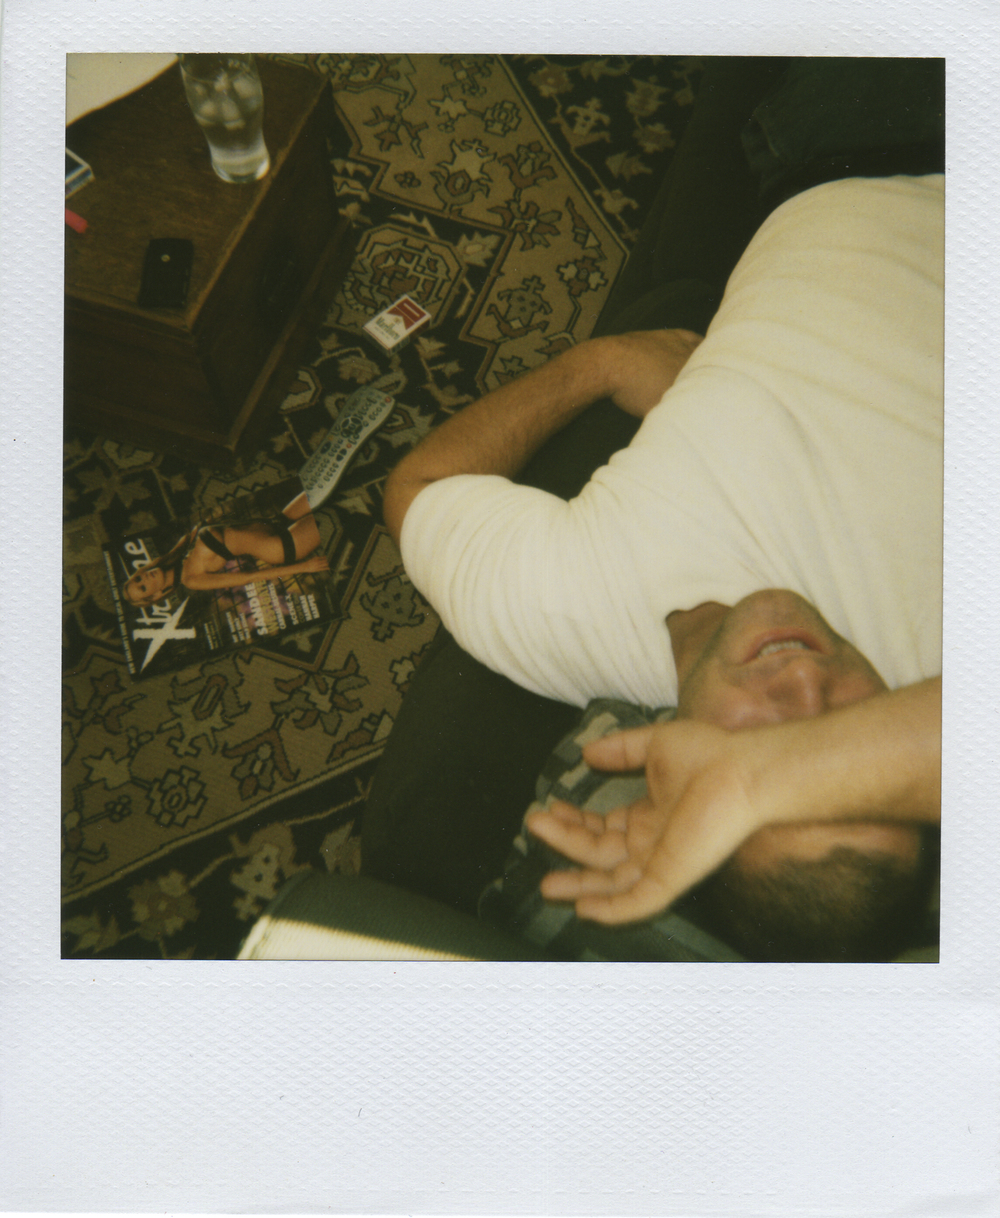 jlaurence-polaroid-164.jpg